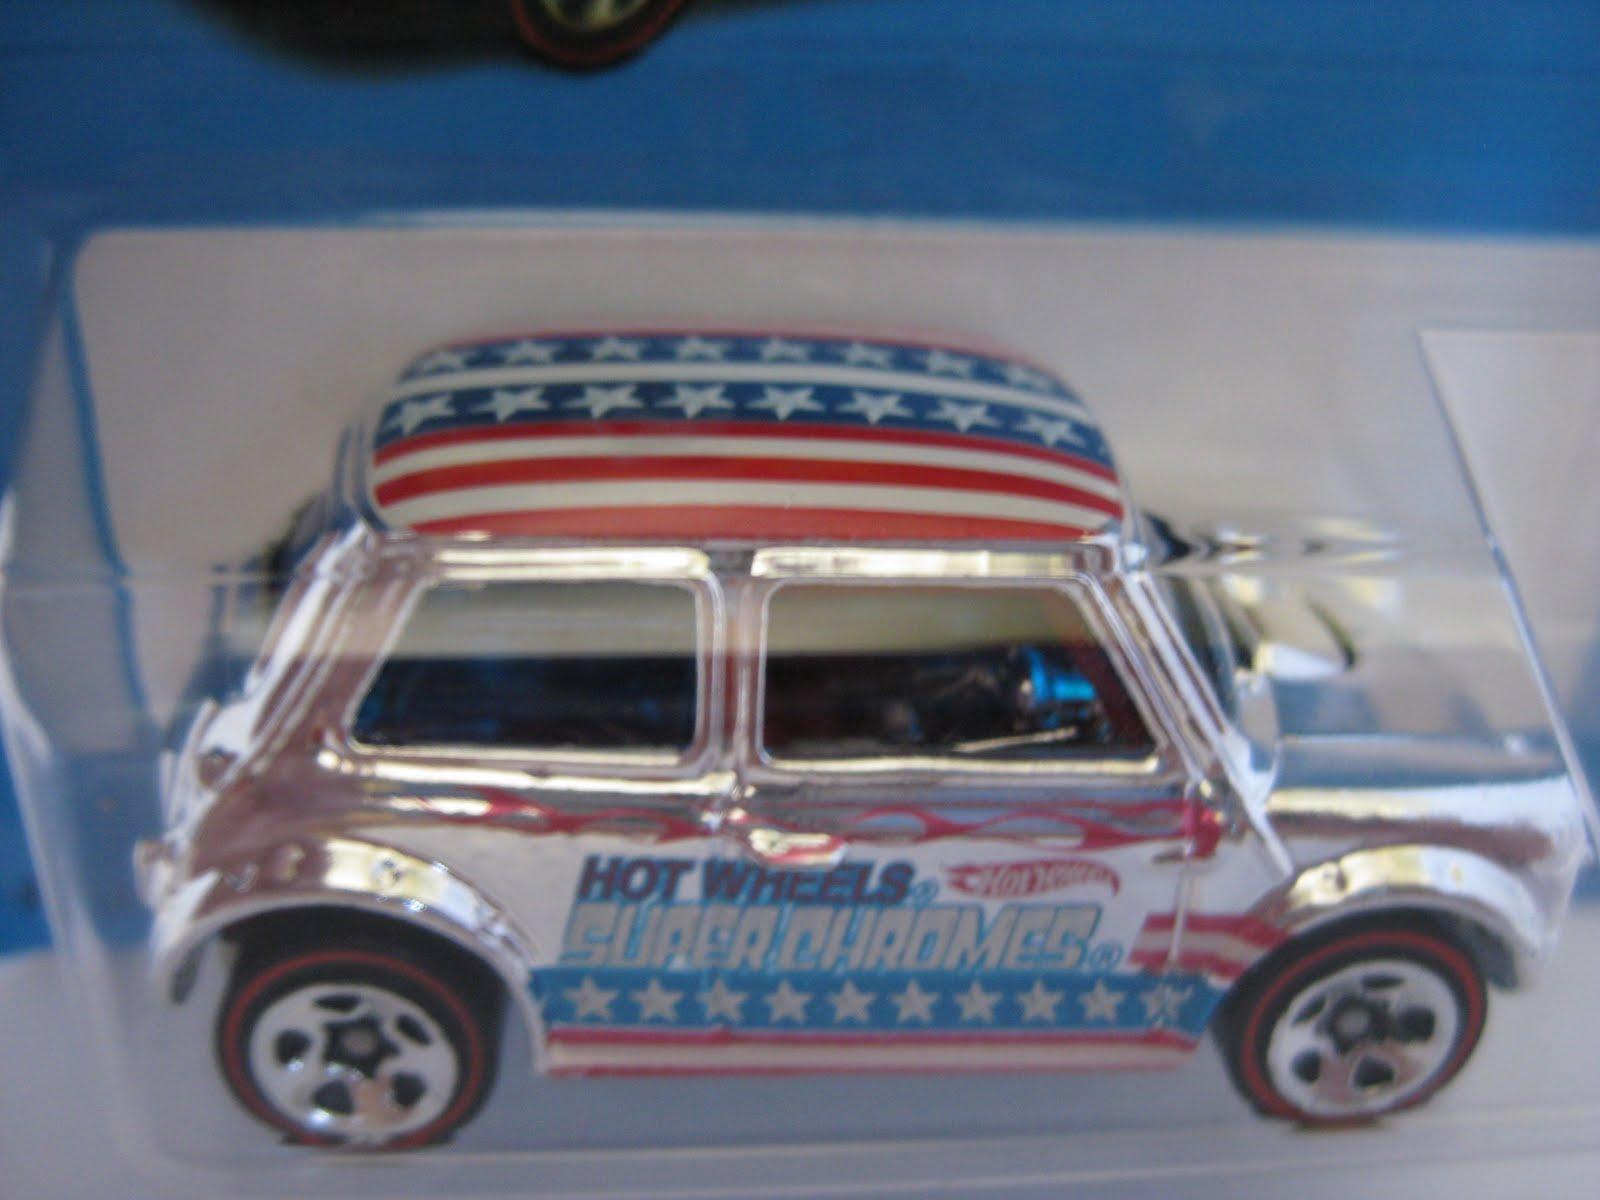 Minikulit Collection Hot Wheels Morris Mini Super Chromes